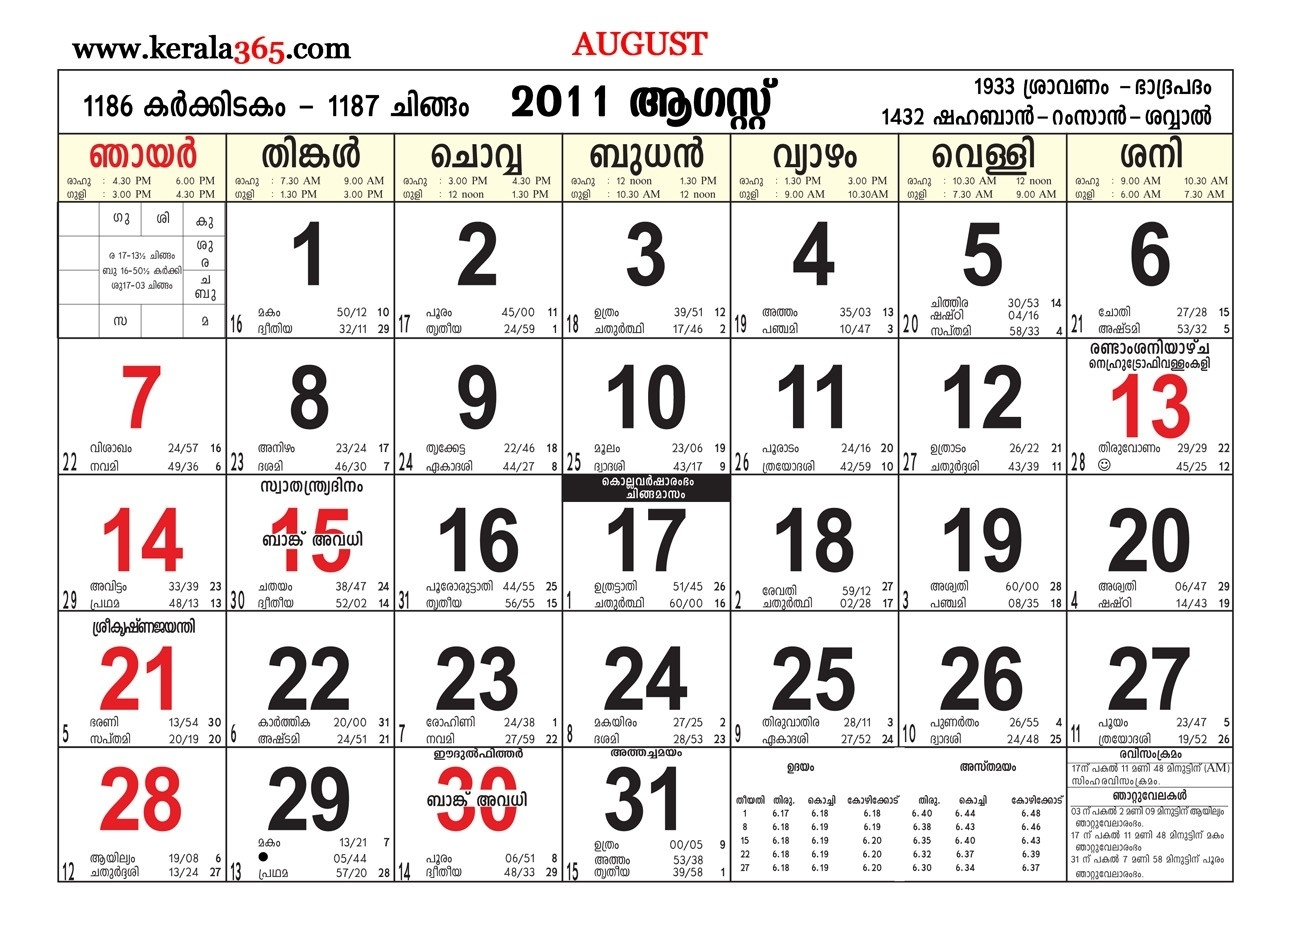 August Calendar 2011 - Calendar throughout Calendar 2001 Malayalam August Image